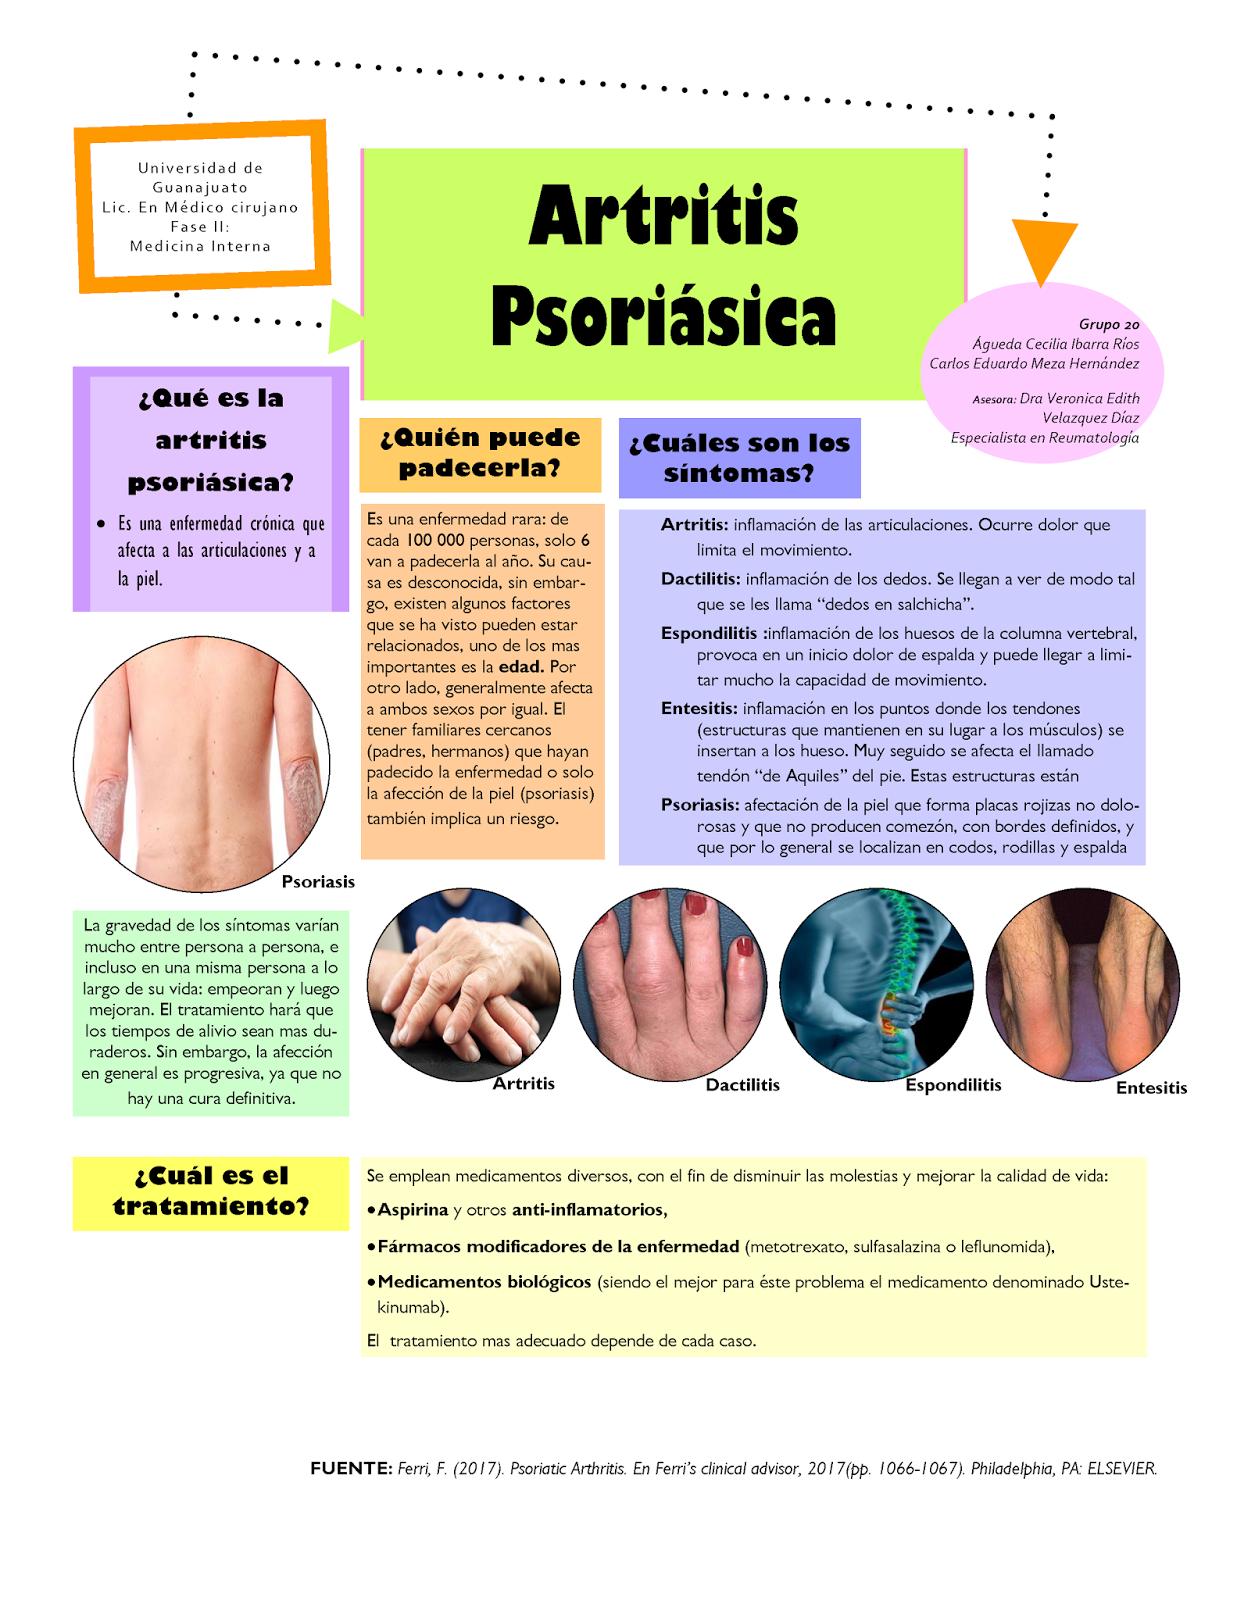 artritis psoriasica dieta sin gluten